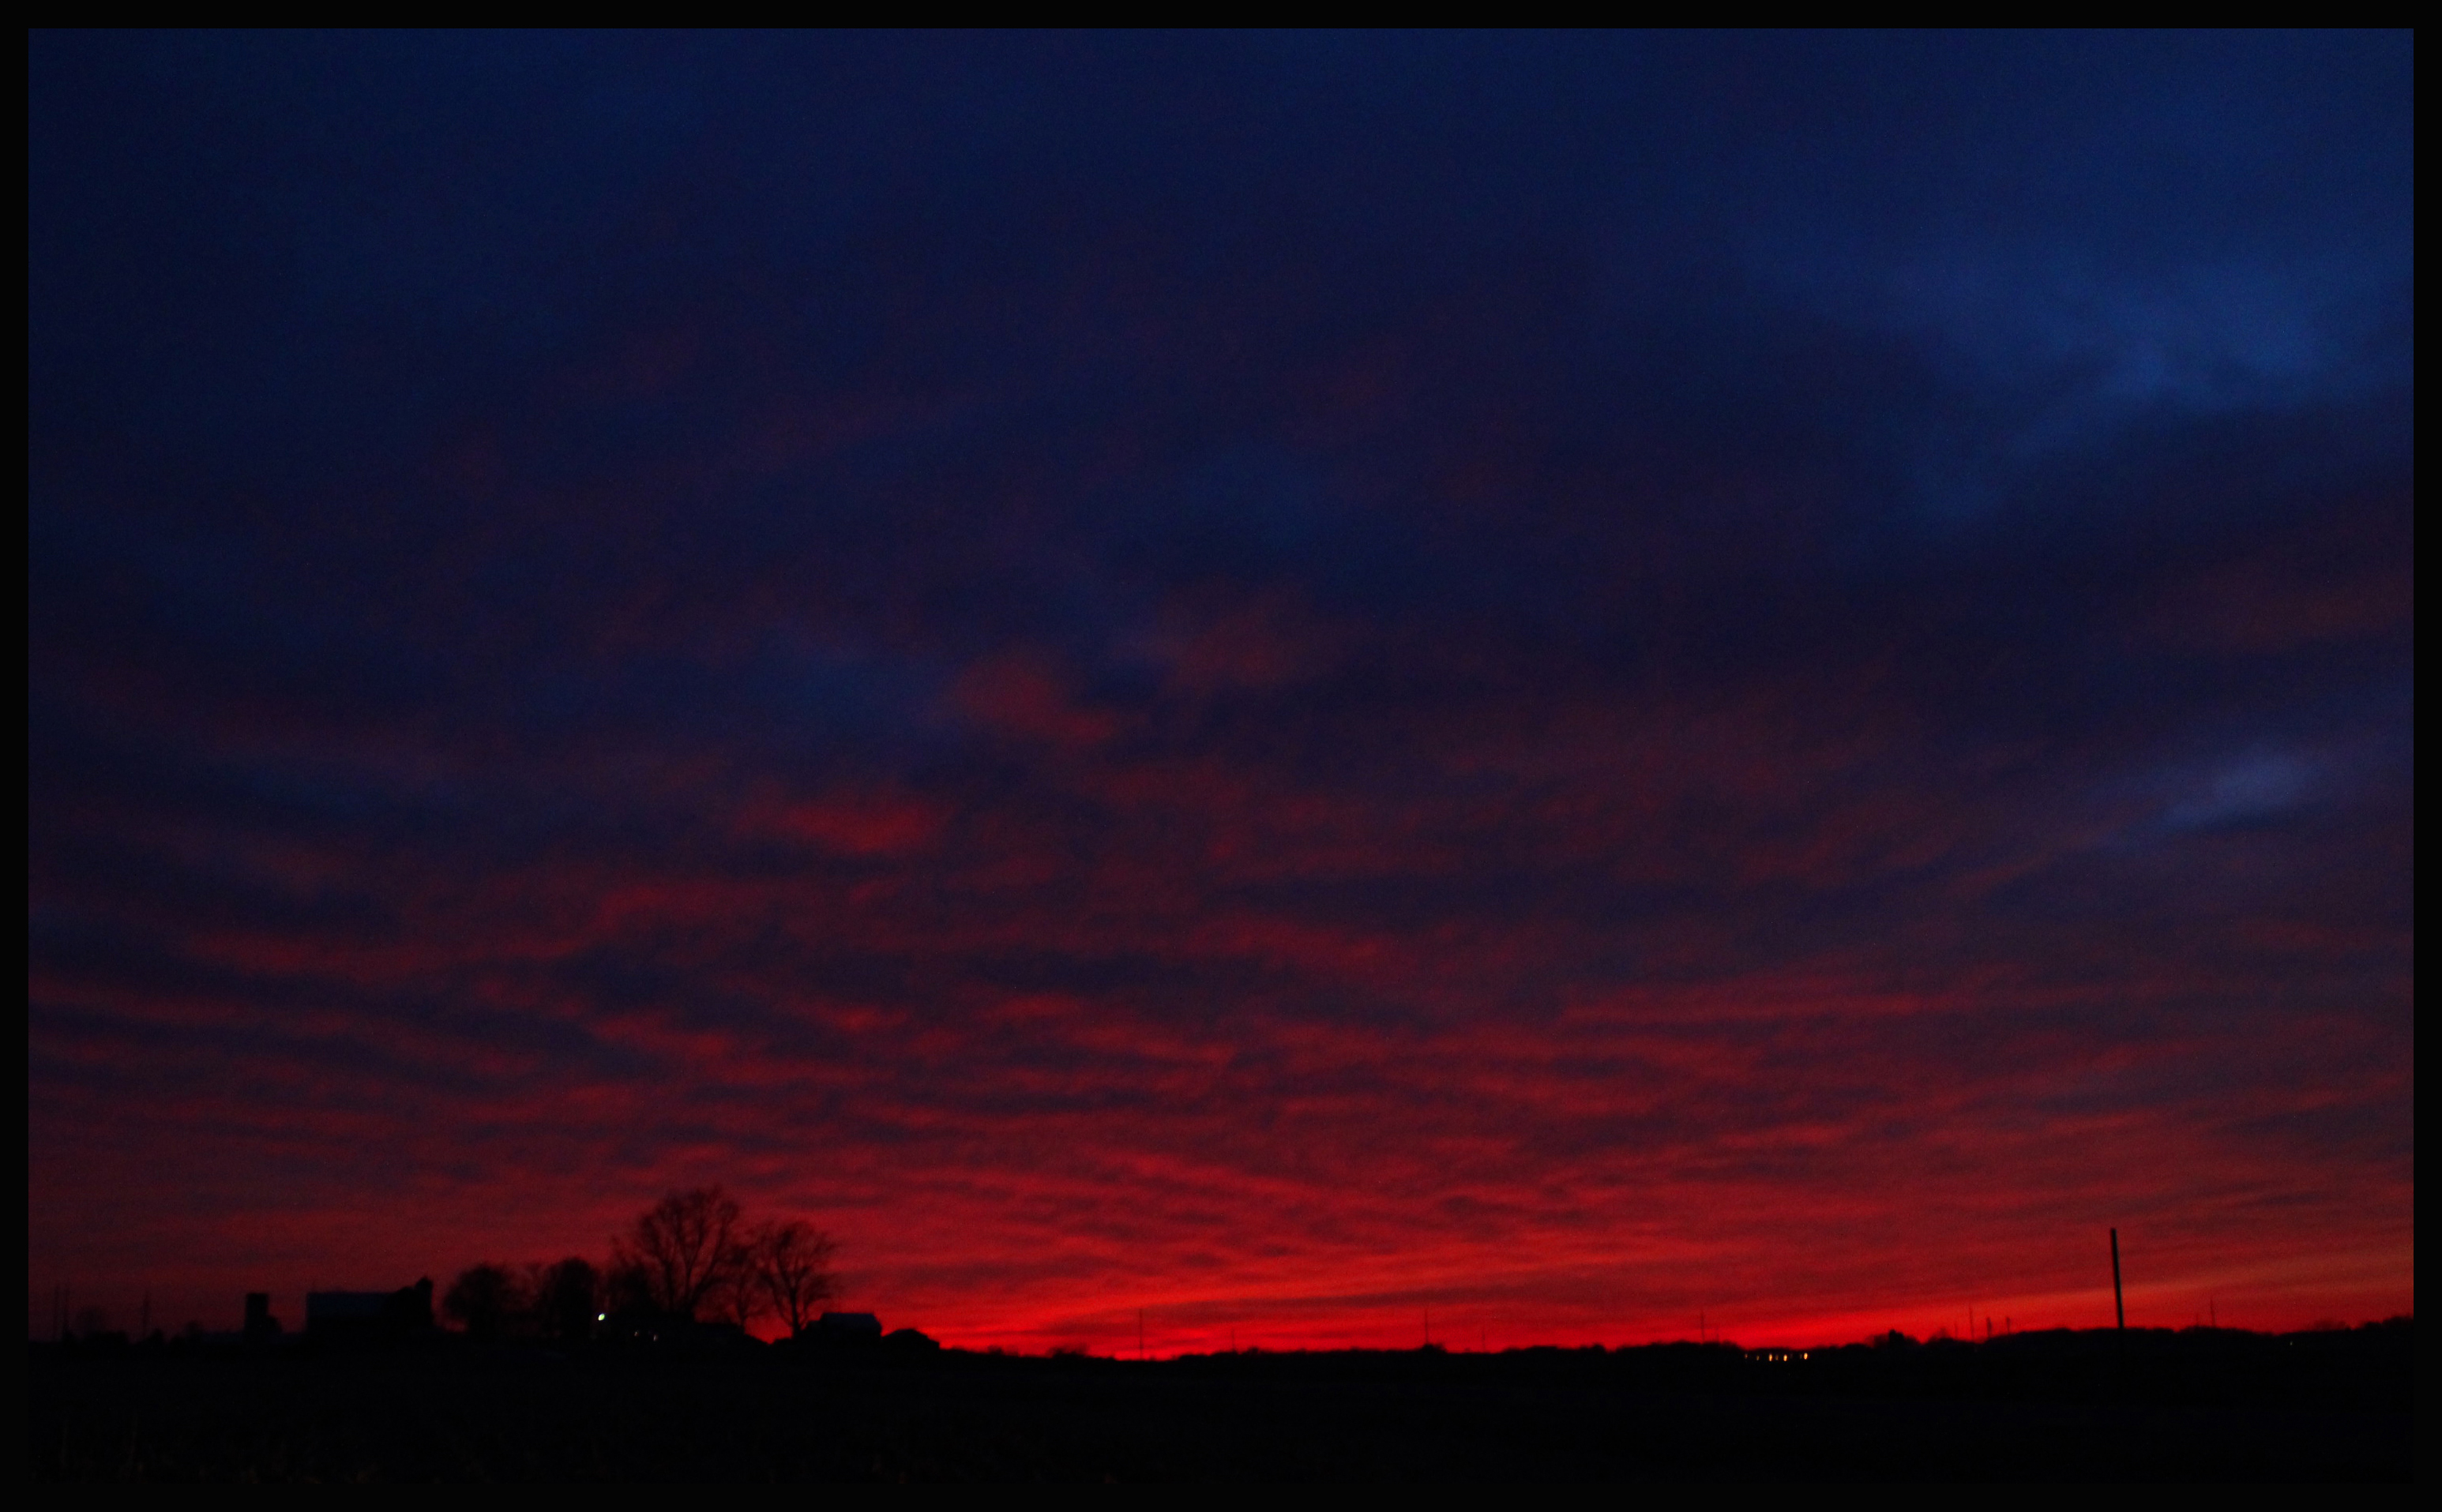 Beautiful Night Sky Wallpaper HD Desktop 890232wx Yoanu 3092x1915